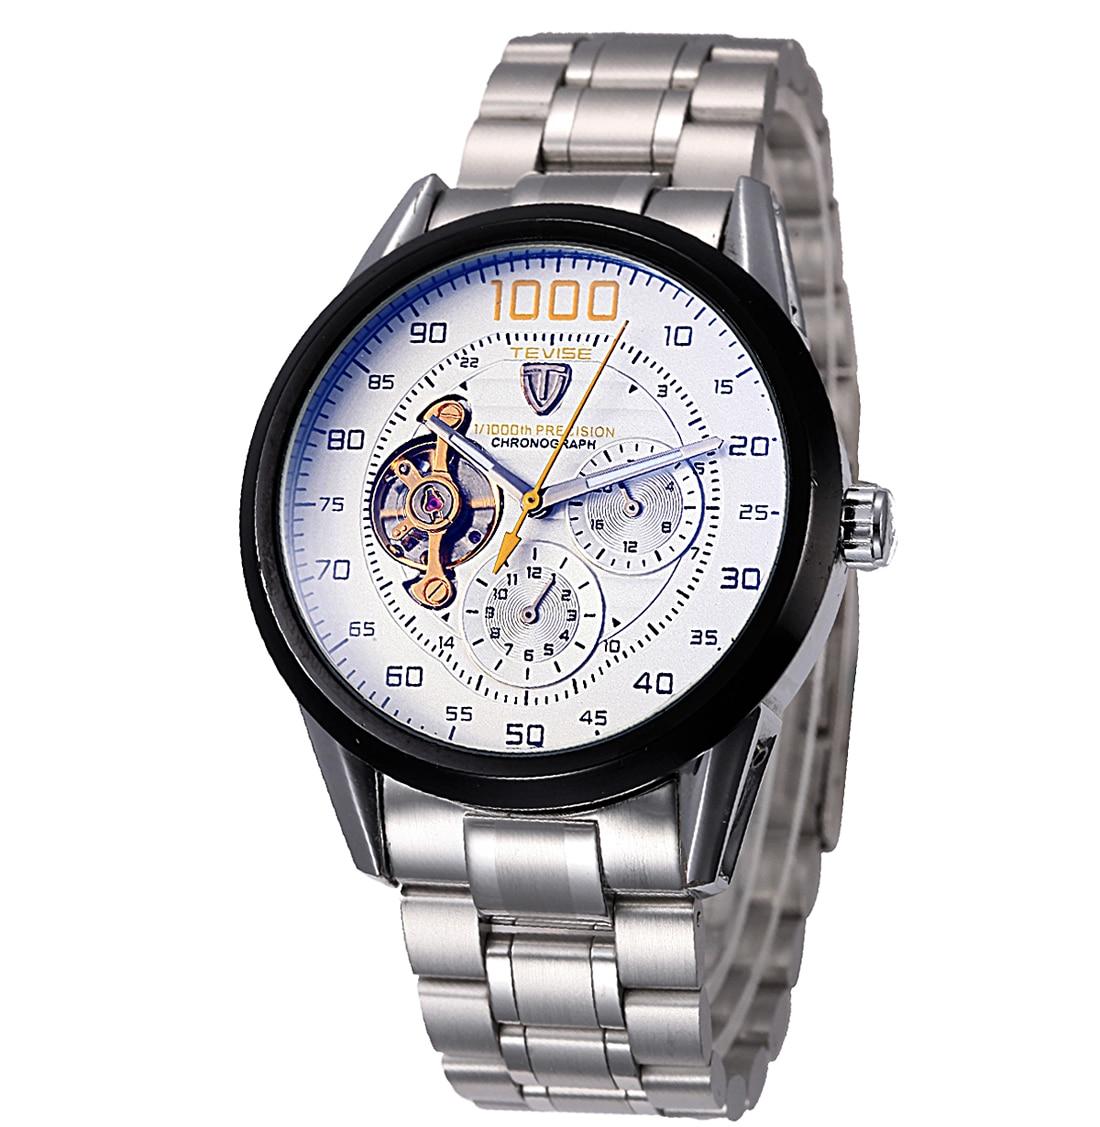 Luxury Quartz Watch Men Brand Military Wrist Watches full stainless steel business watches new outdoor watch Relogio Masculino<br>